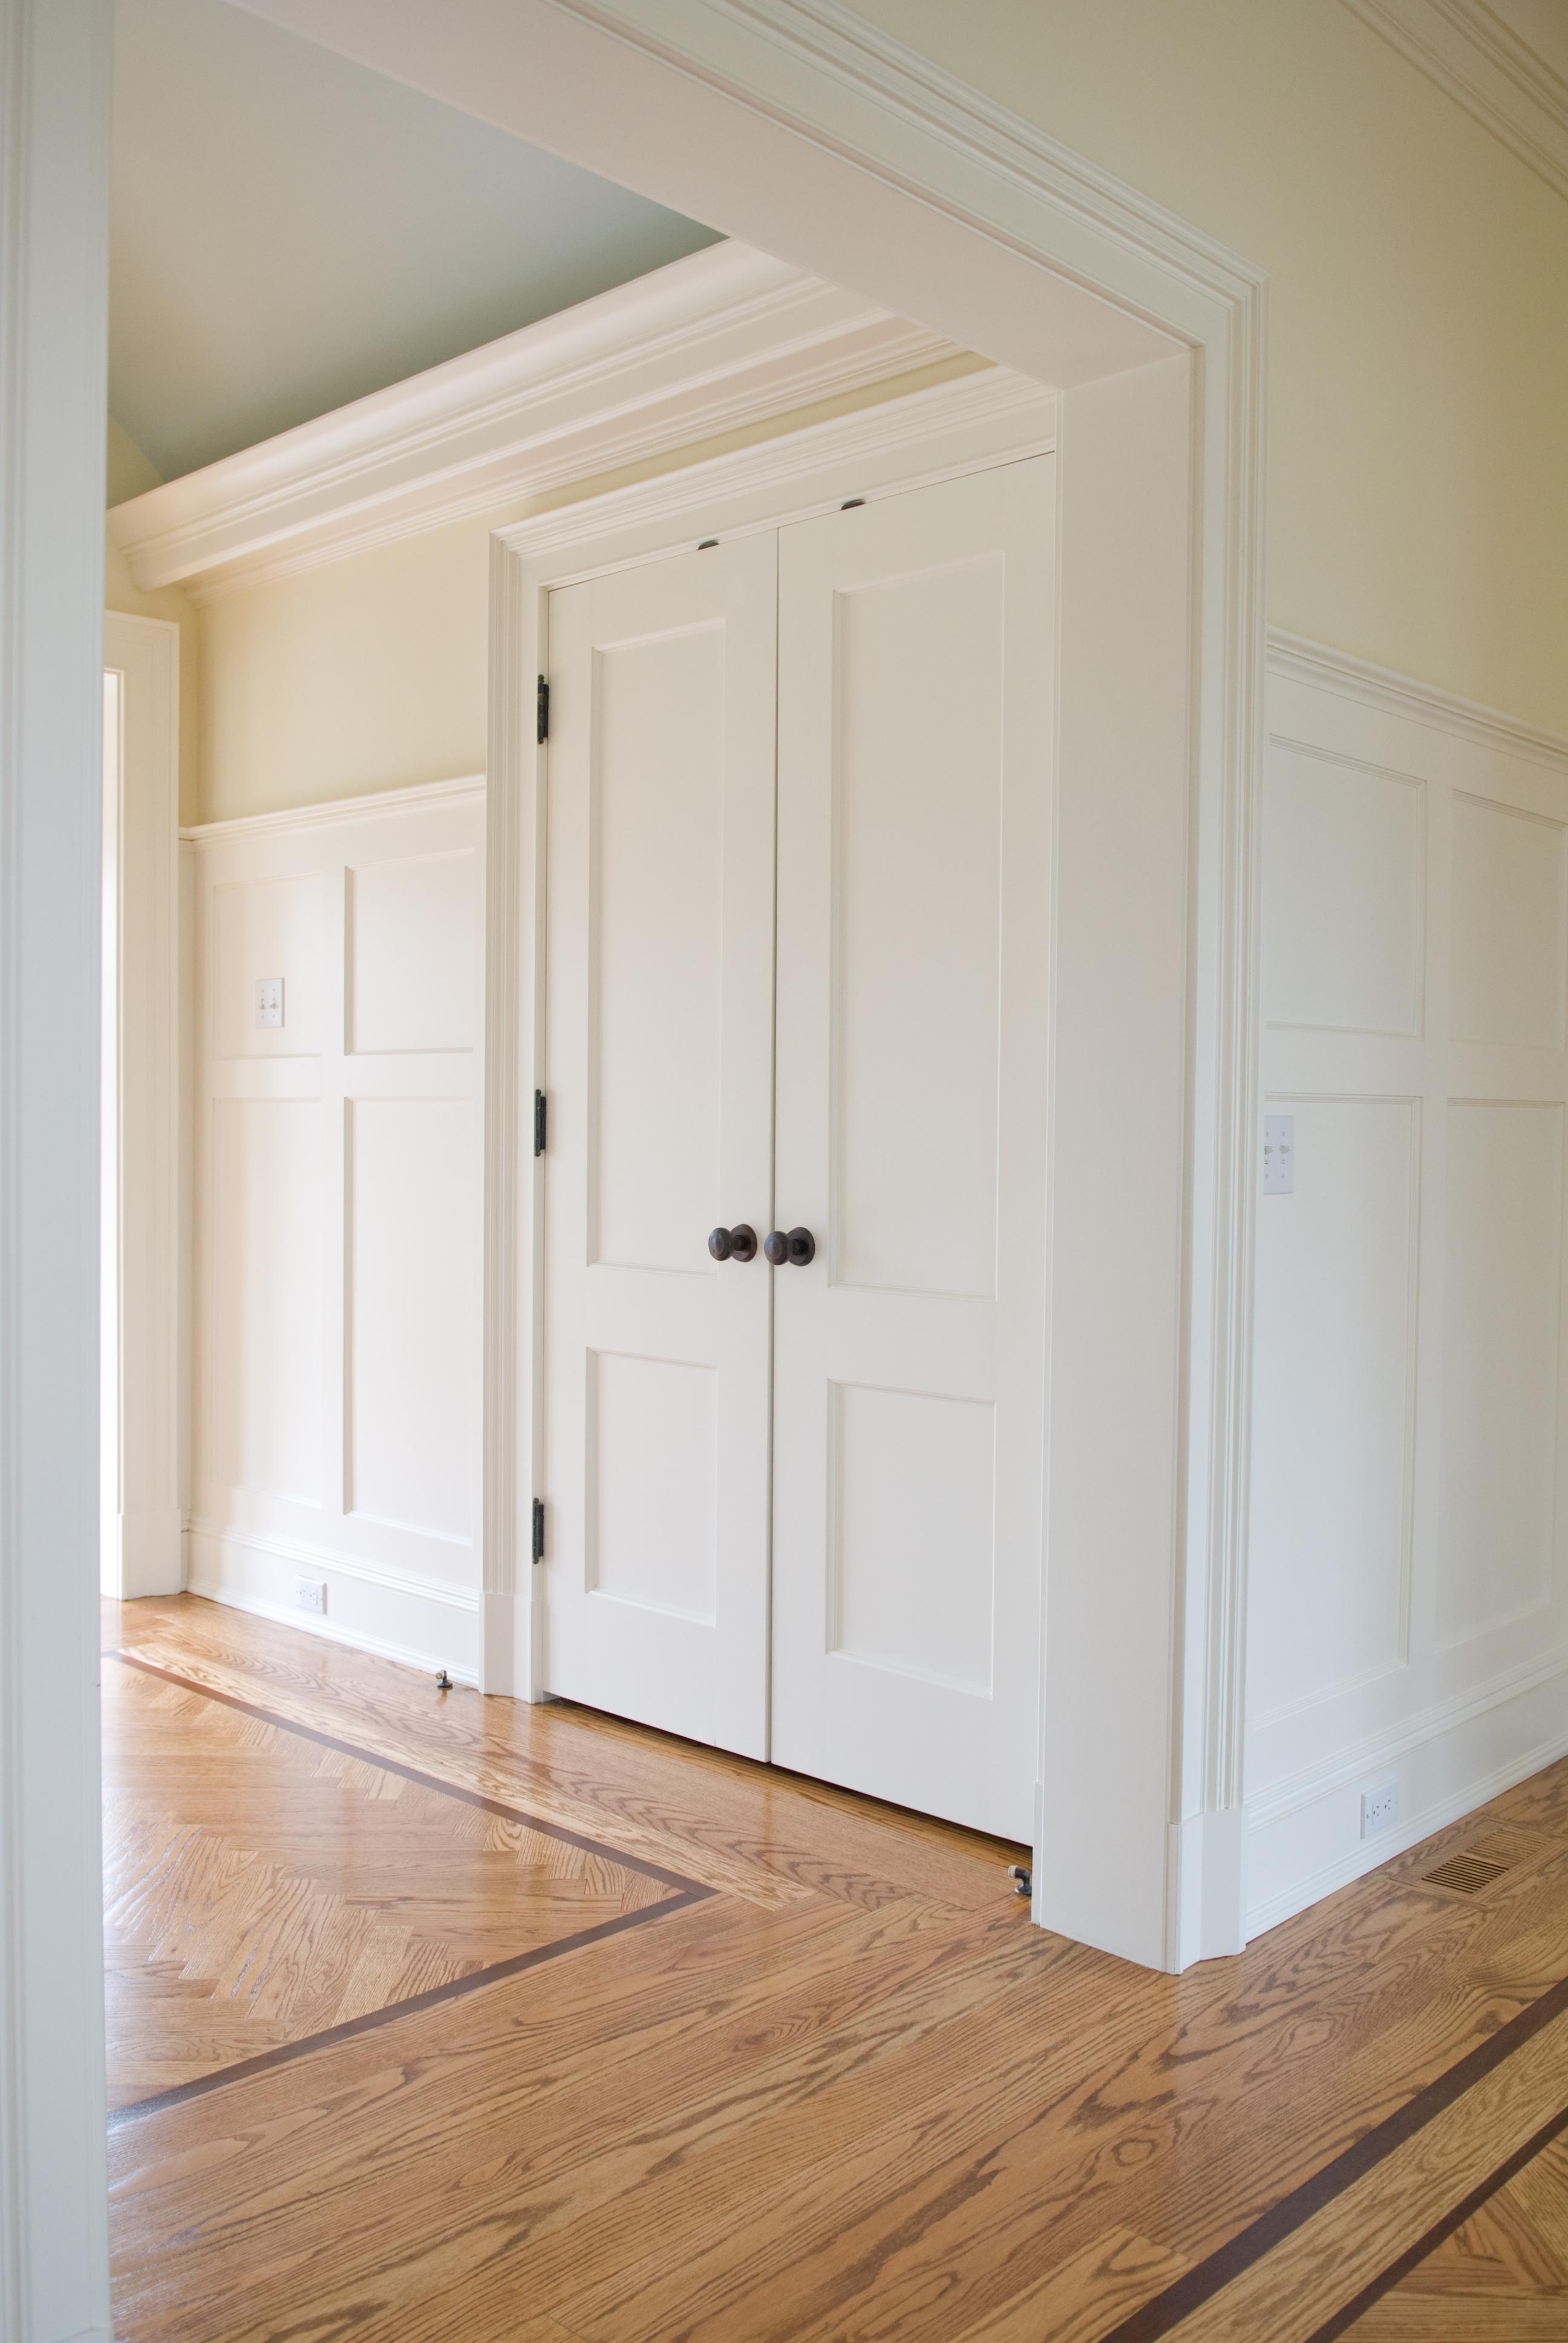 Ts2060 trustile doors for Trustile doors cost